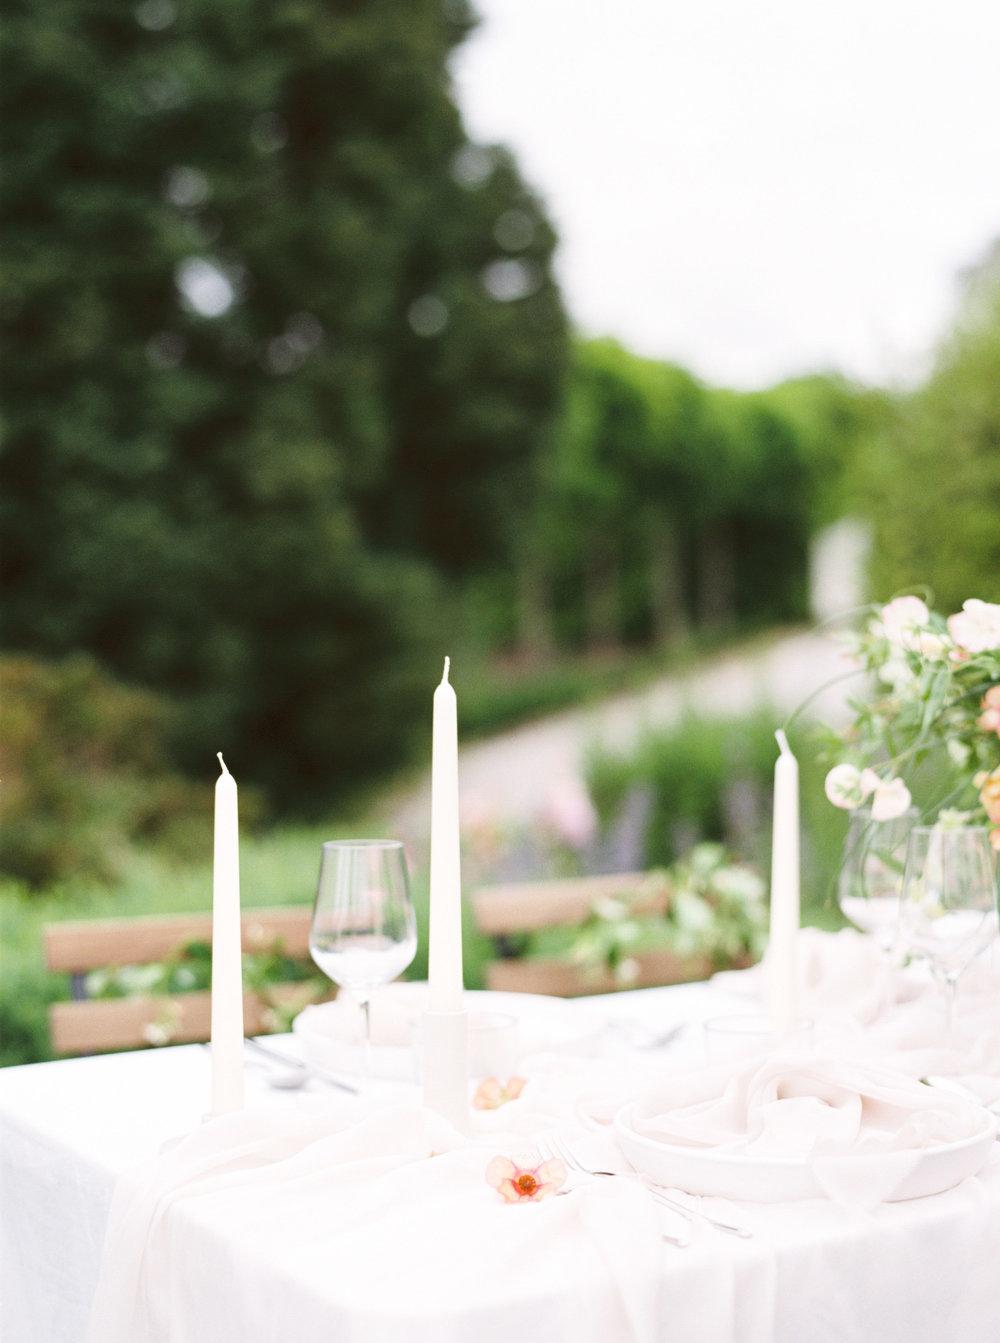 Timeless Southern Highland Wedding Elopement in Bowral NSW Fine Art Film Photographer Sheri McMahon-49.jpg